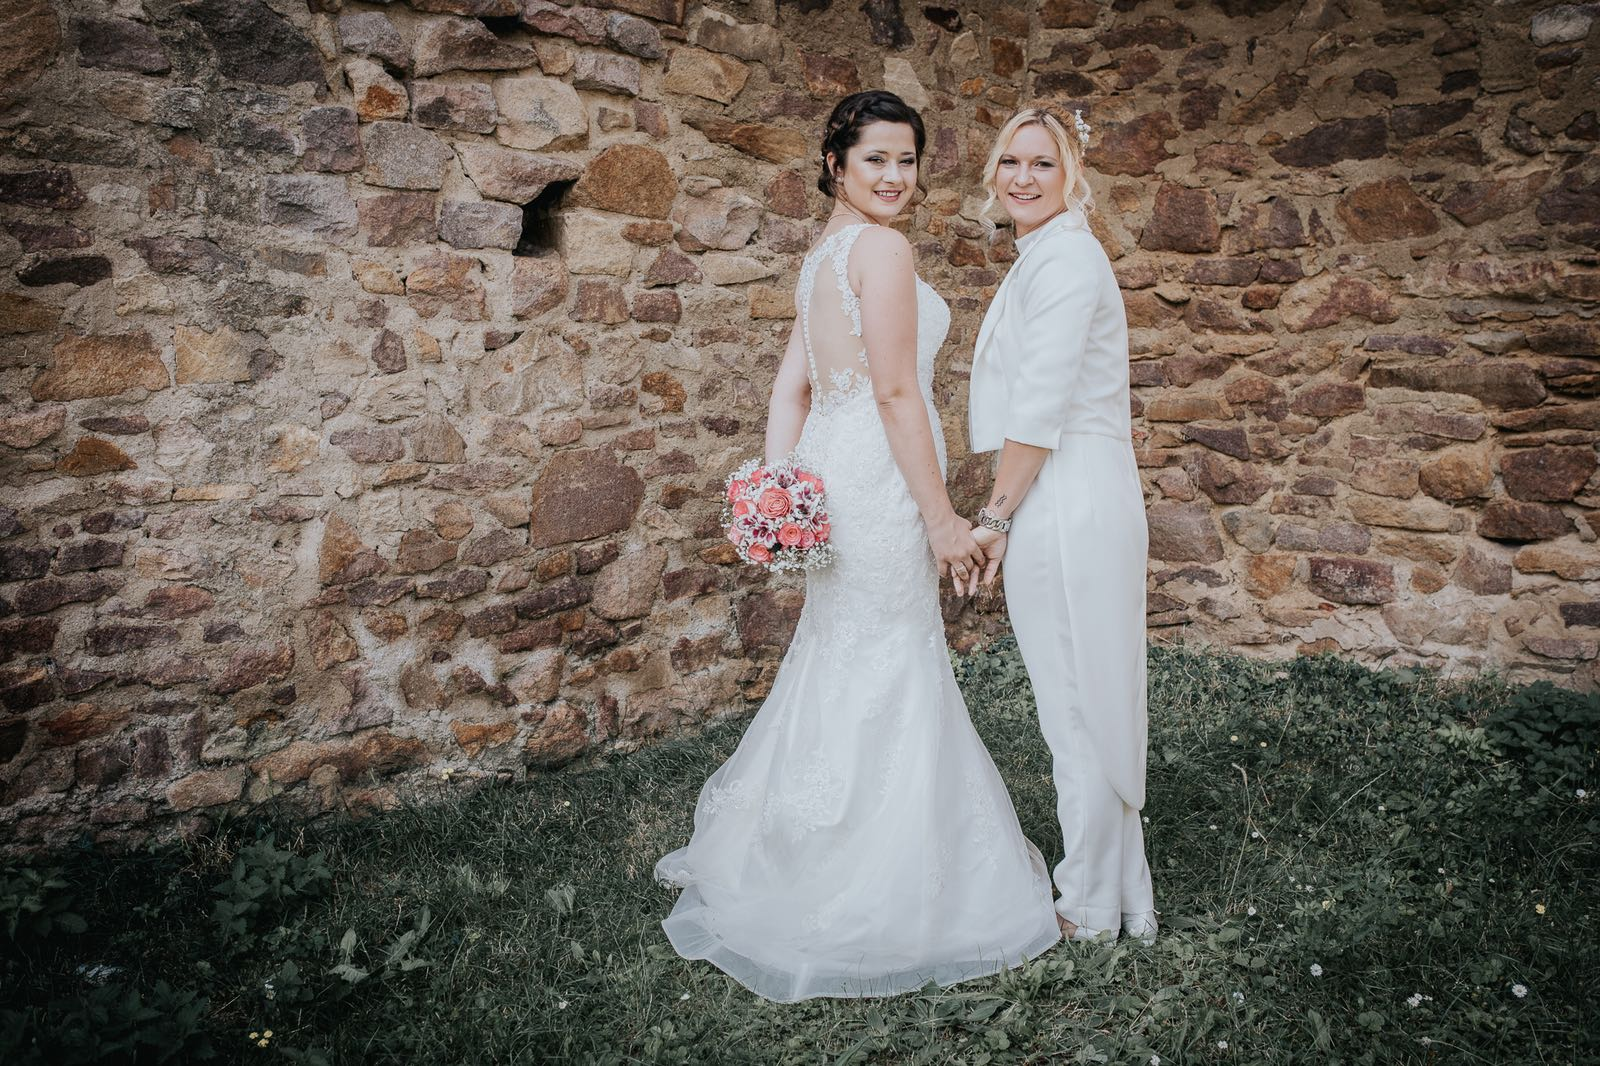 Anika & Laura © Fotografie Kern